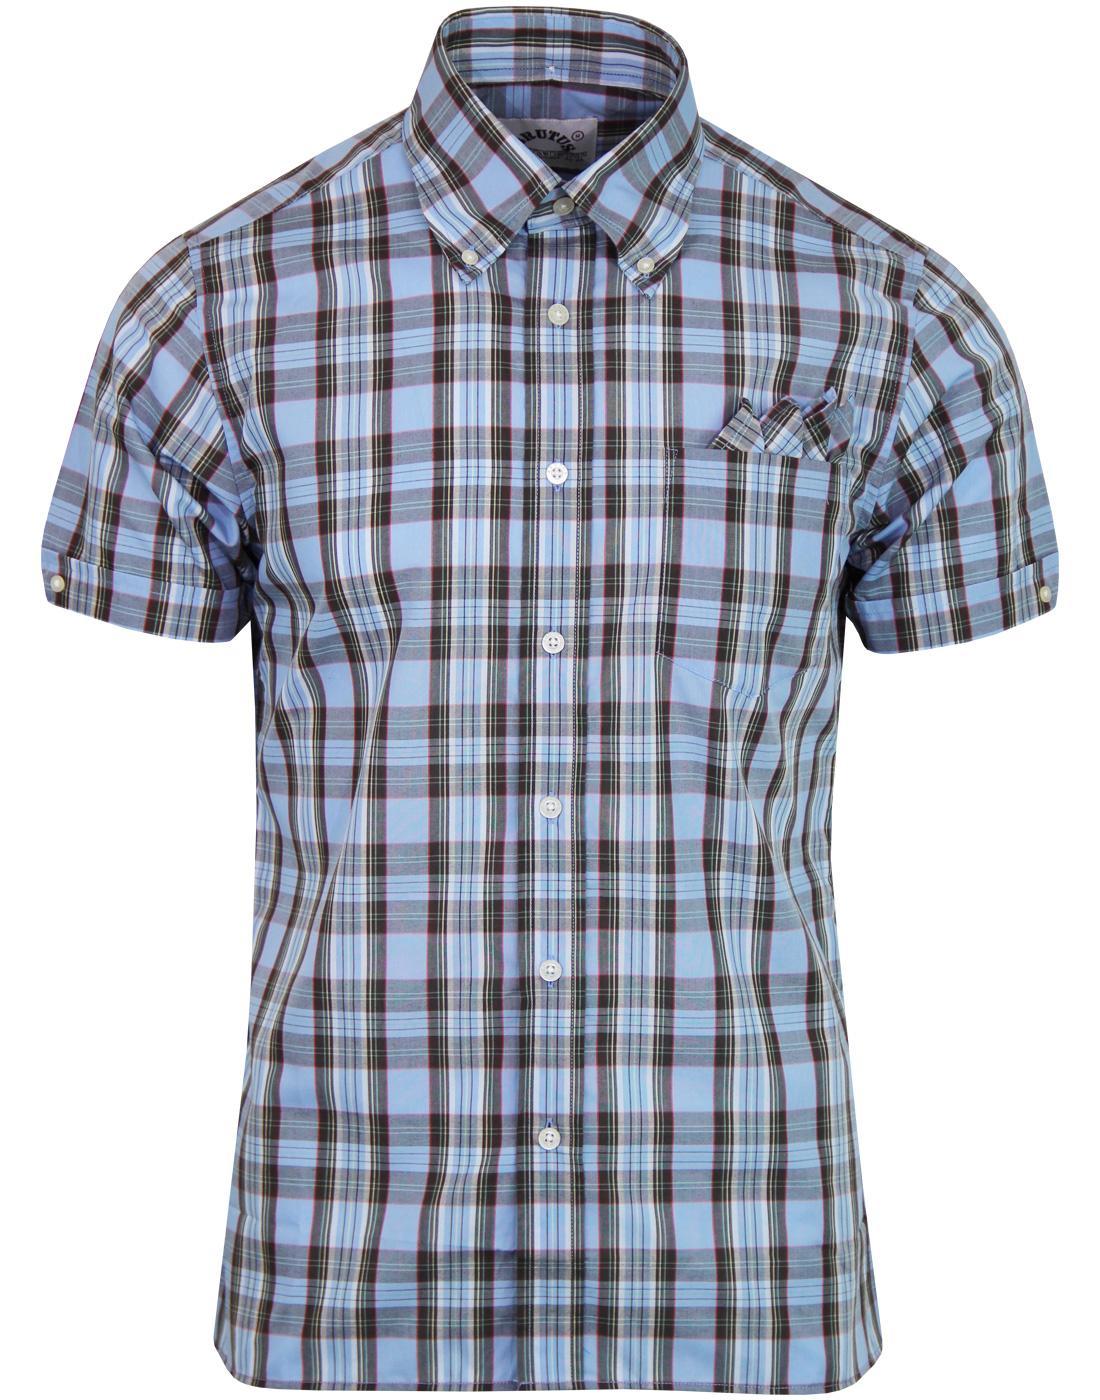 BRUTUS TRIMFIT 1960s Mod Tartan Check Shirt (Blue)